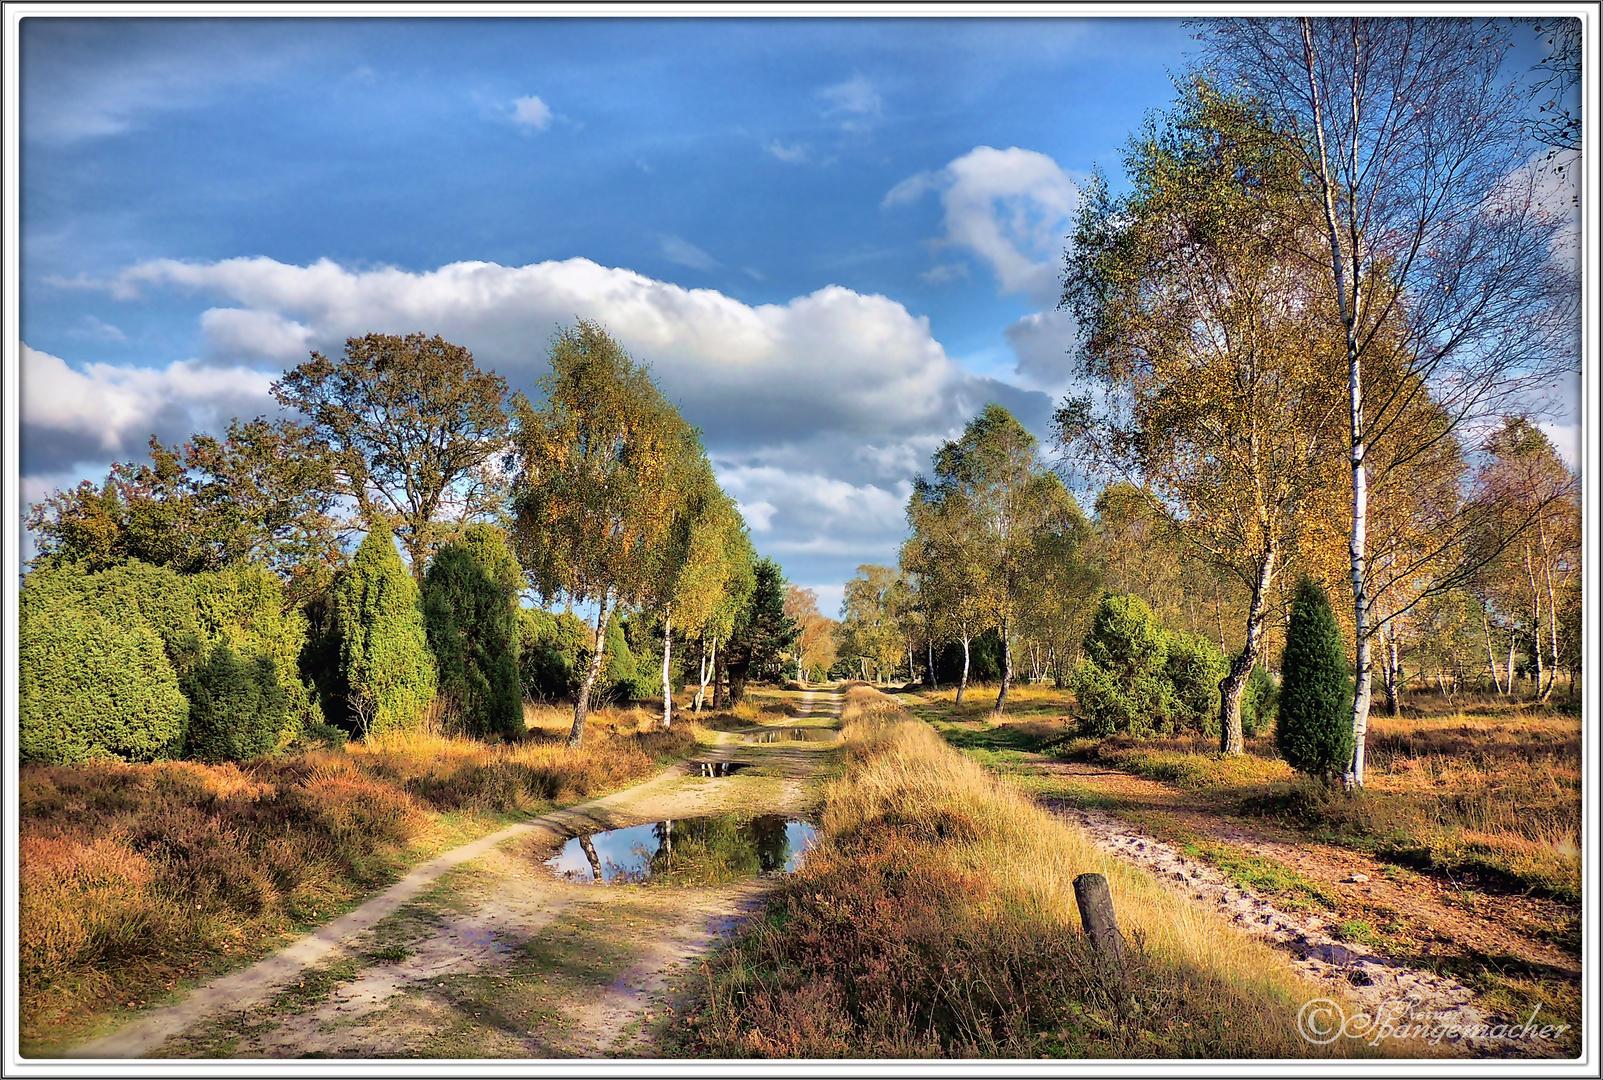 Herbst in der Lüneburger Heide